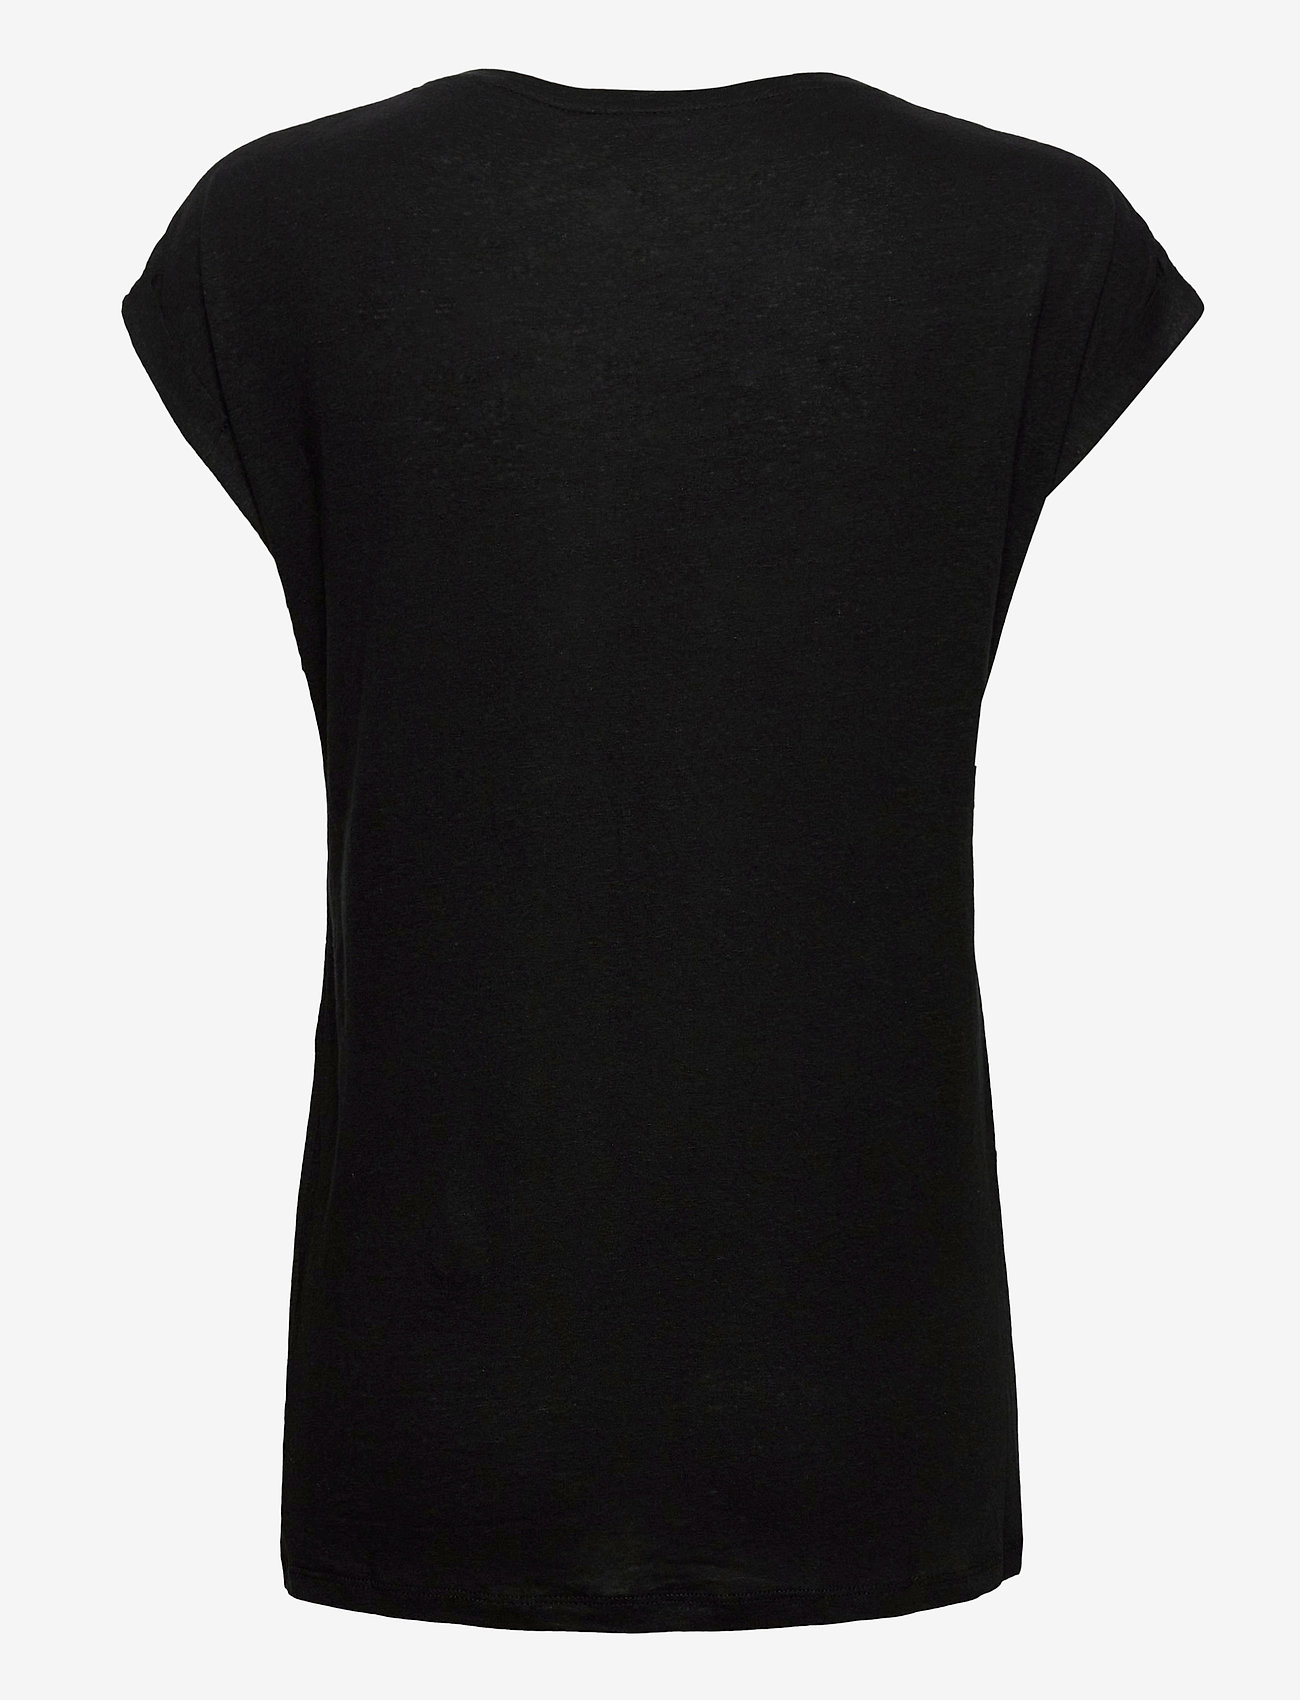 Soyaconcept - SC-ISABEL - t-shirts - black - 1